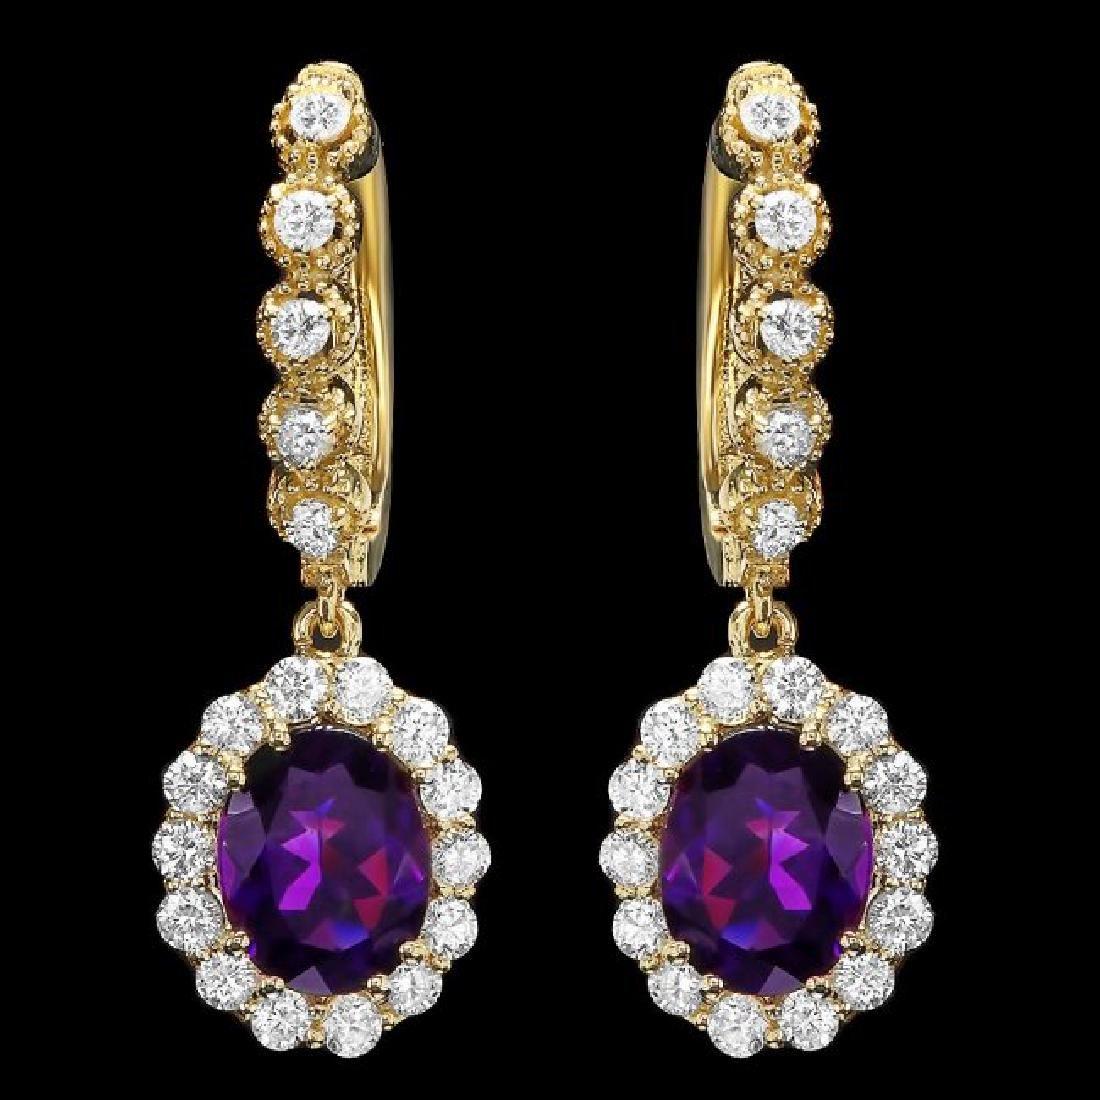 14k Gold 3.70ct Amethyst 1.30ct Diamond Earrings